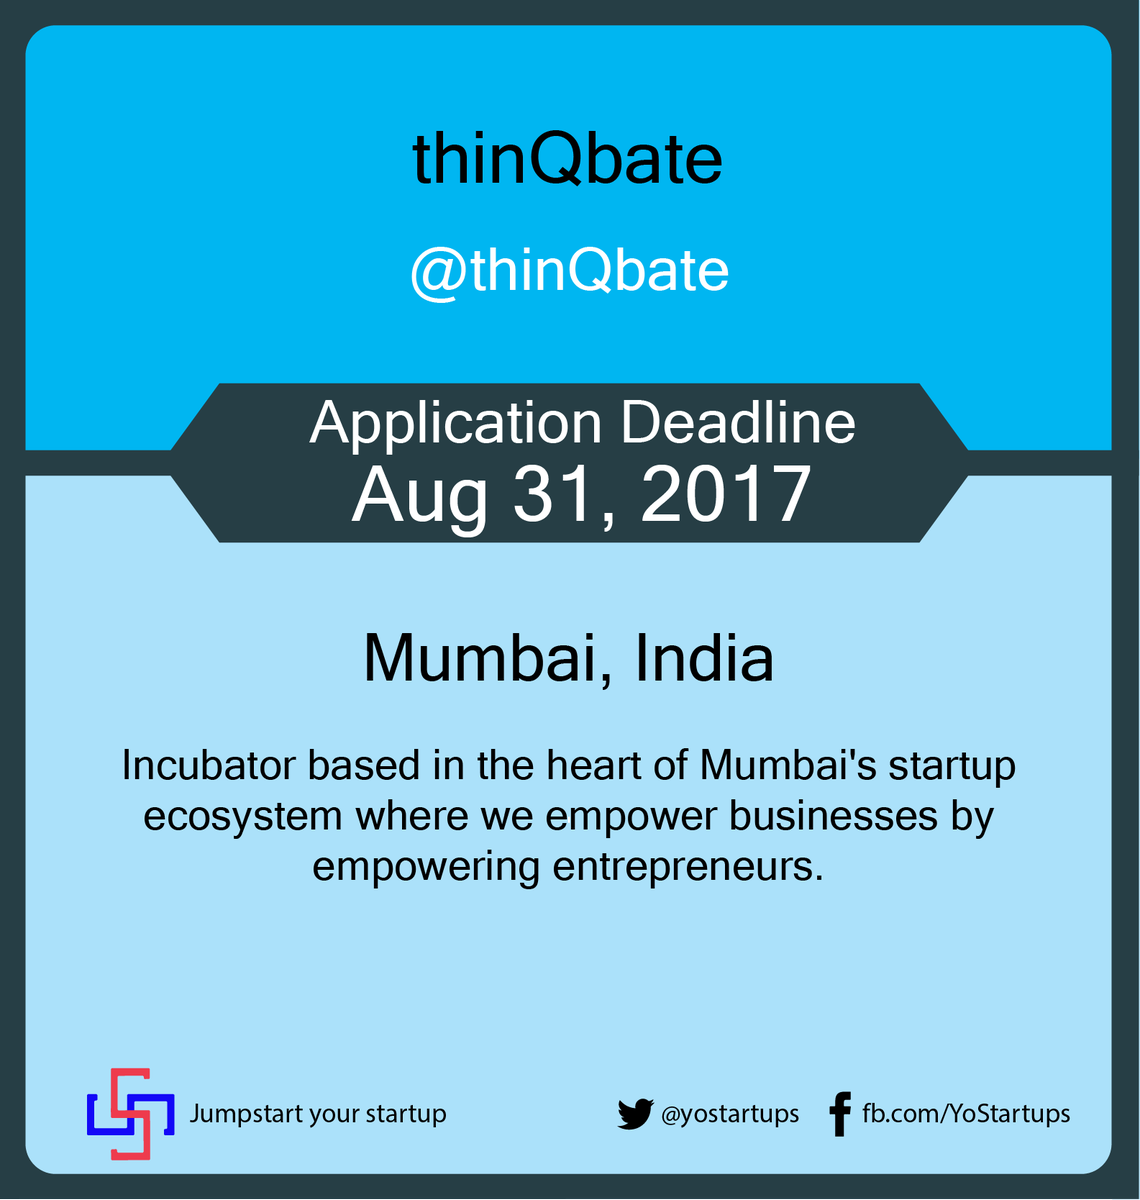 Checkout @thinQbate Empowering businesses by empowering entrepreneurs #accelerator #startups #YoStartups  https:// goo.gl/kZvyQY  &nbsp;  <br>http://pic.twitter.com/Qknsf7tSOA